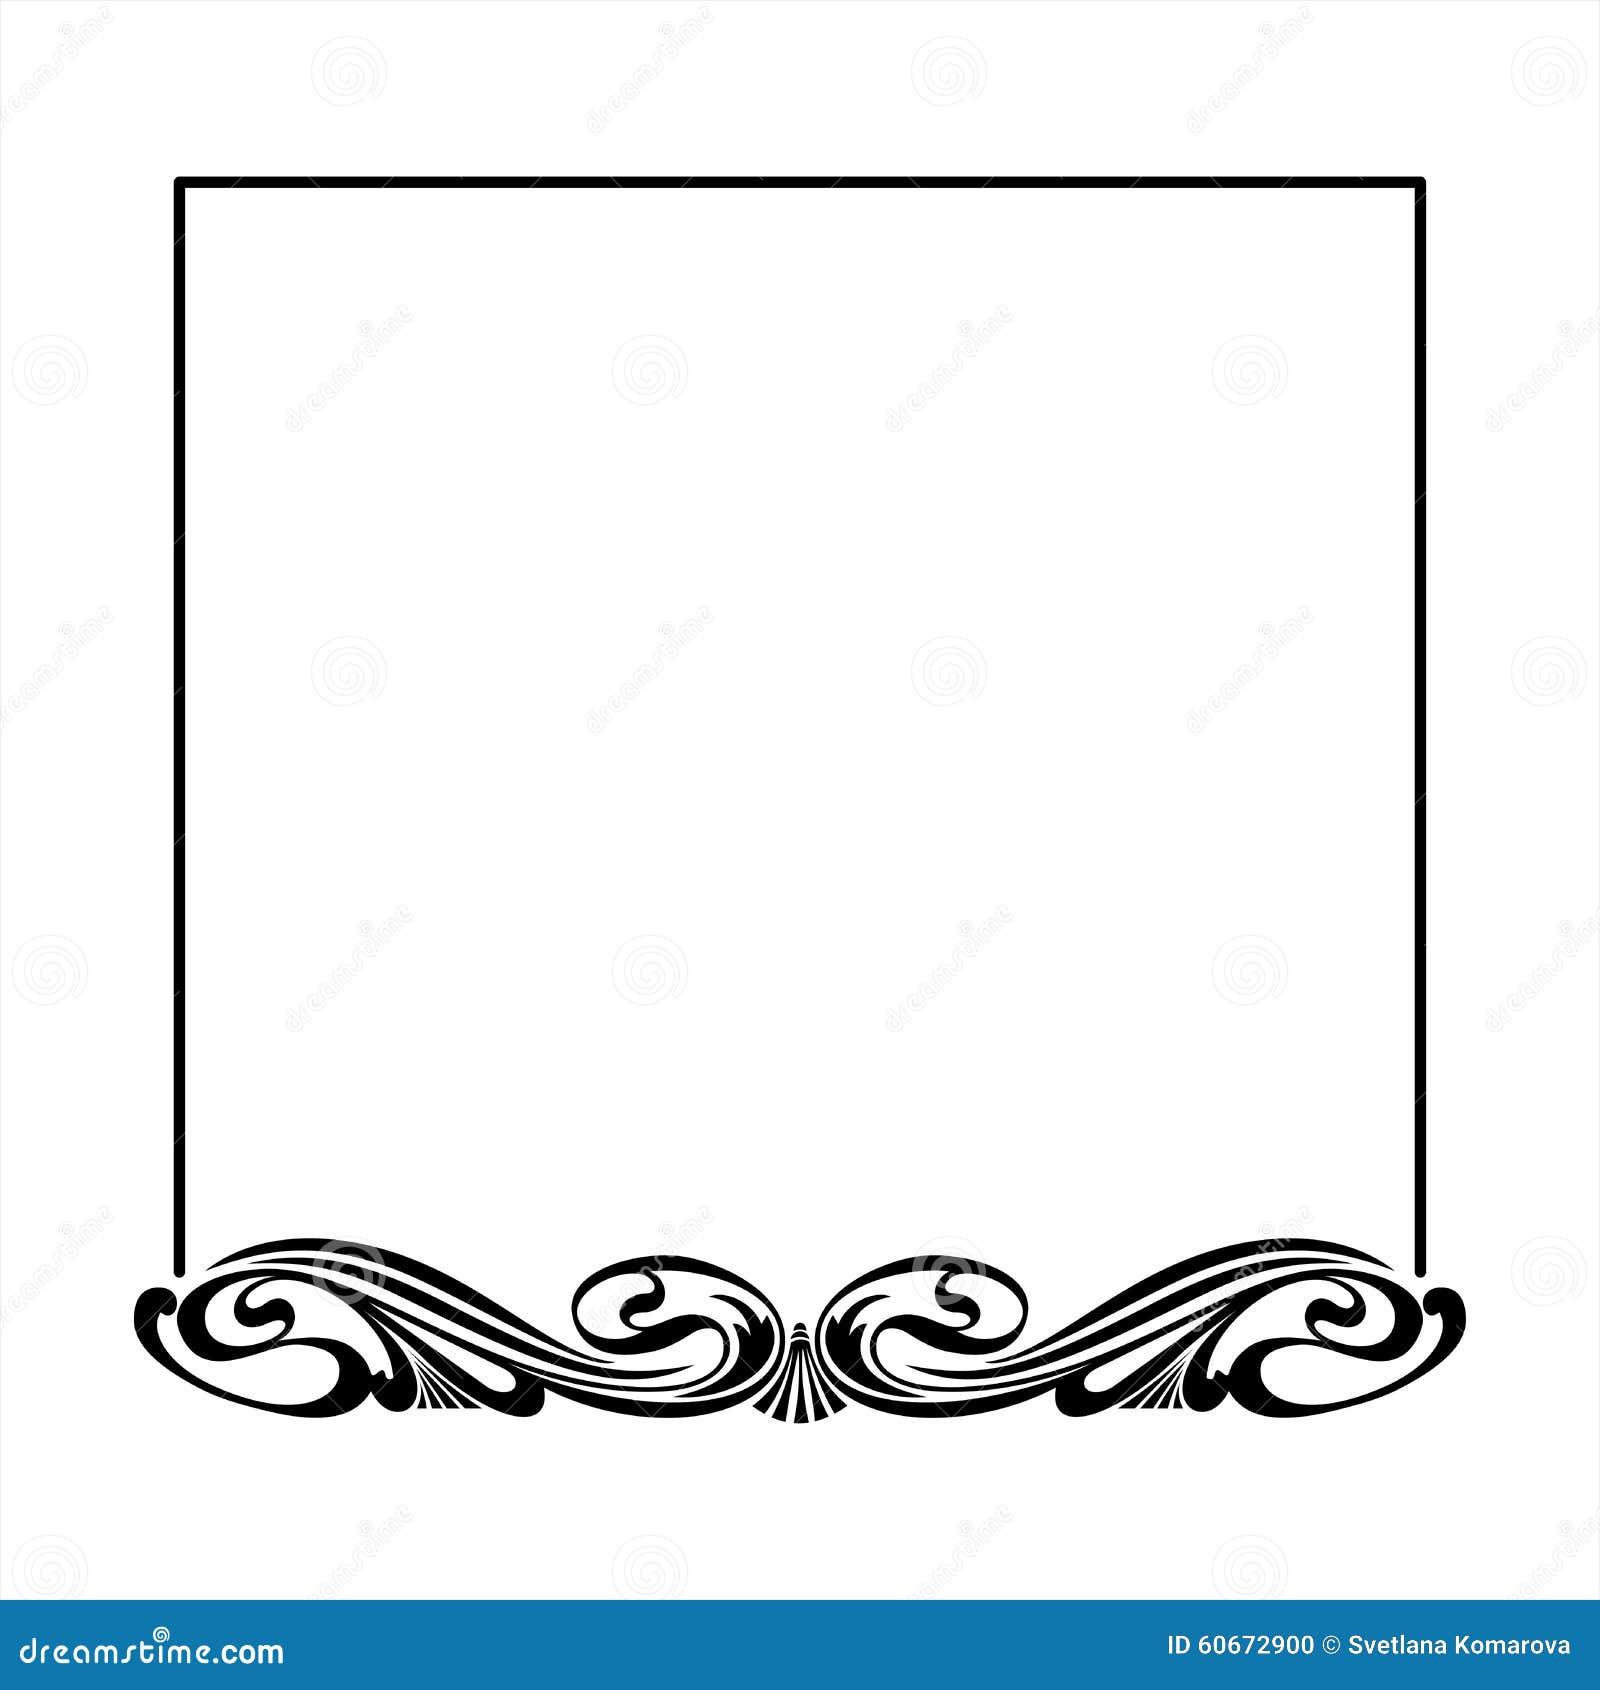 Decorative Square Frame Stock Vector - Image: 60672900Fancy Square Frame